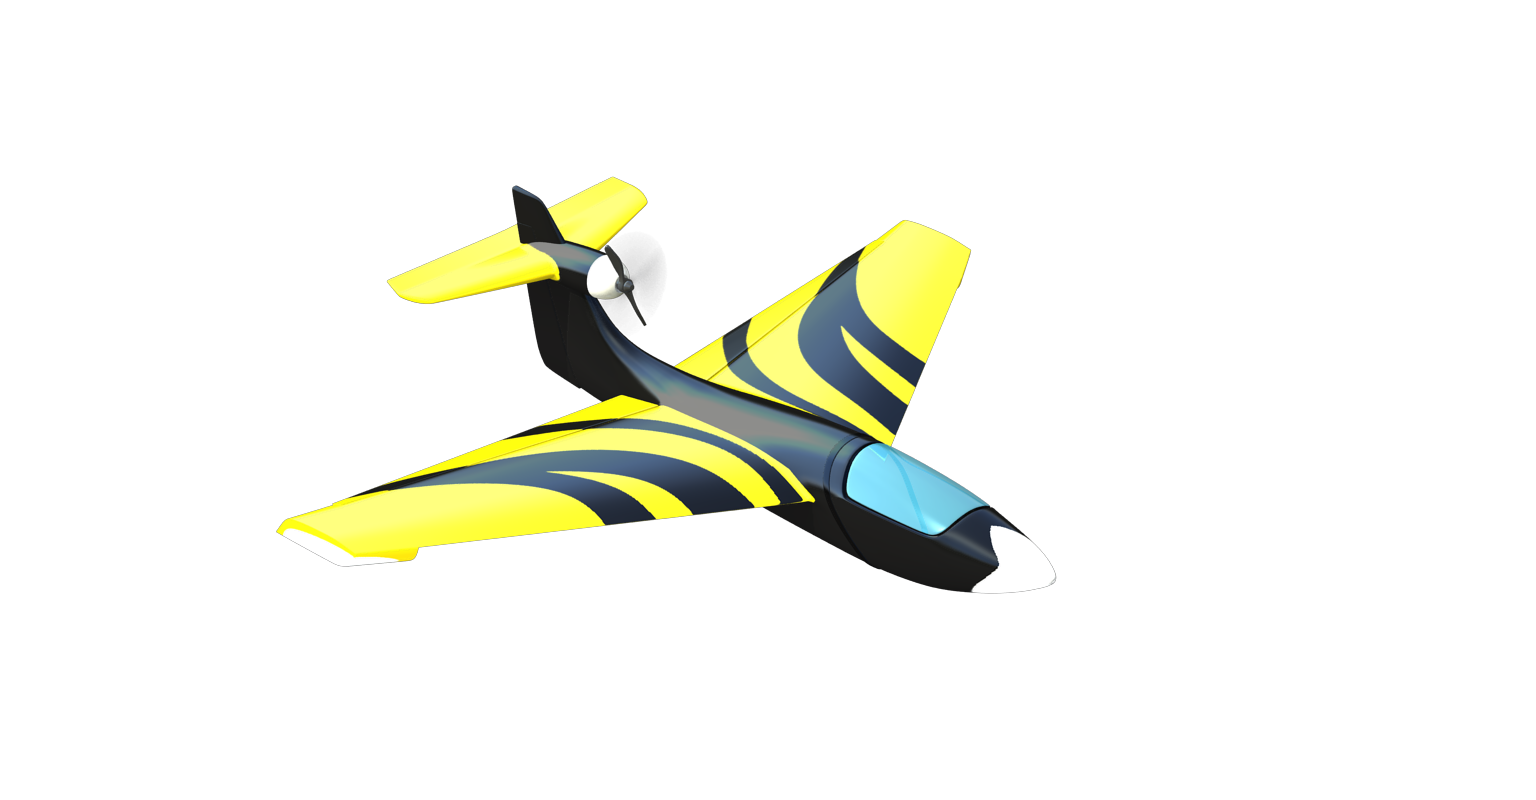 olympic2016_seaplane2_bonus_highres.png